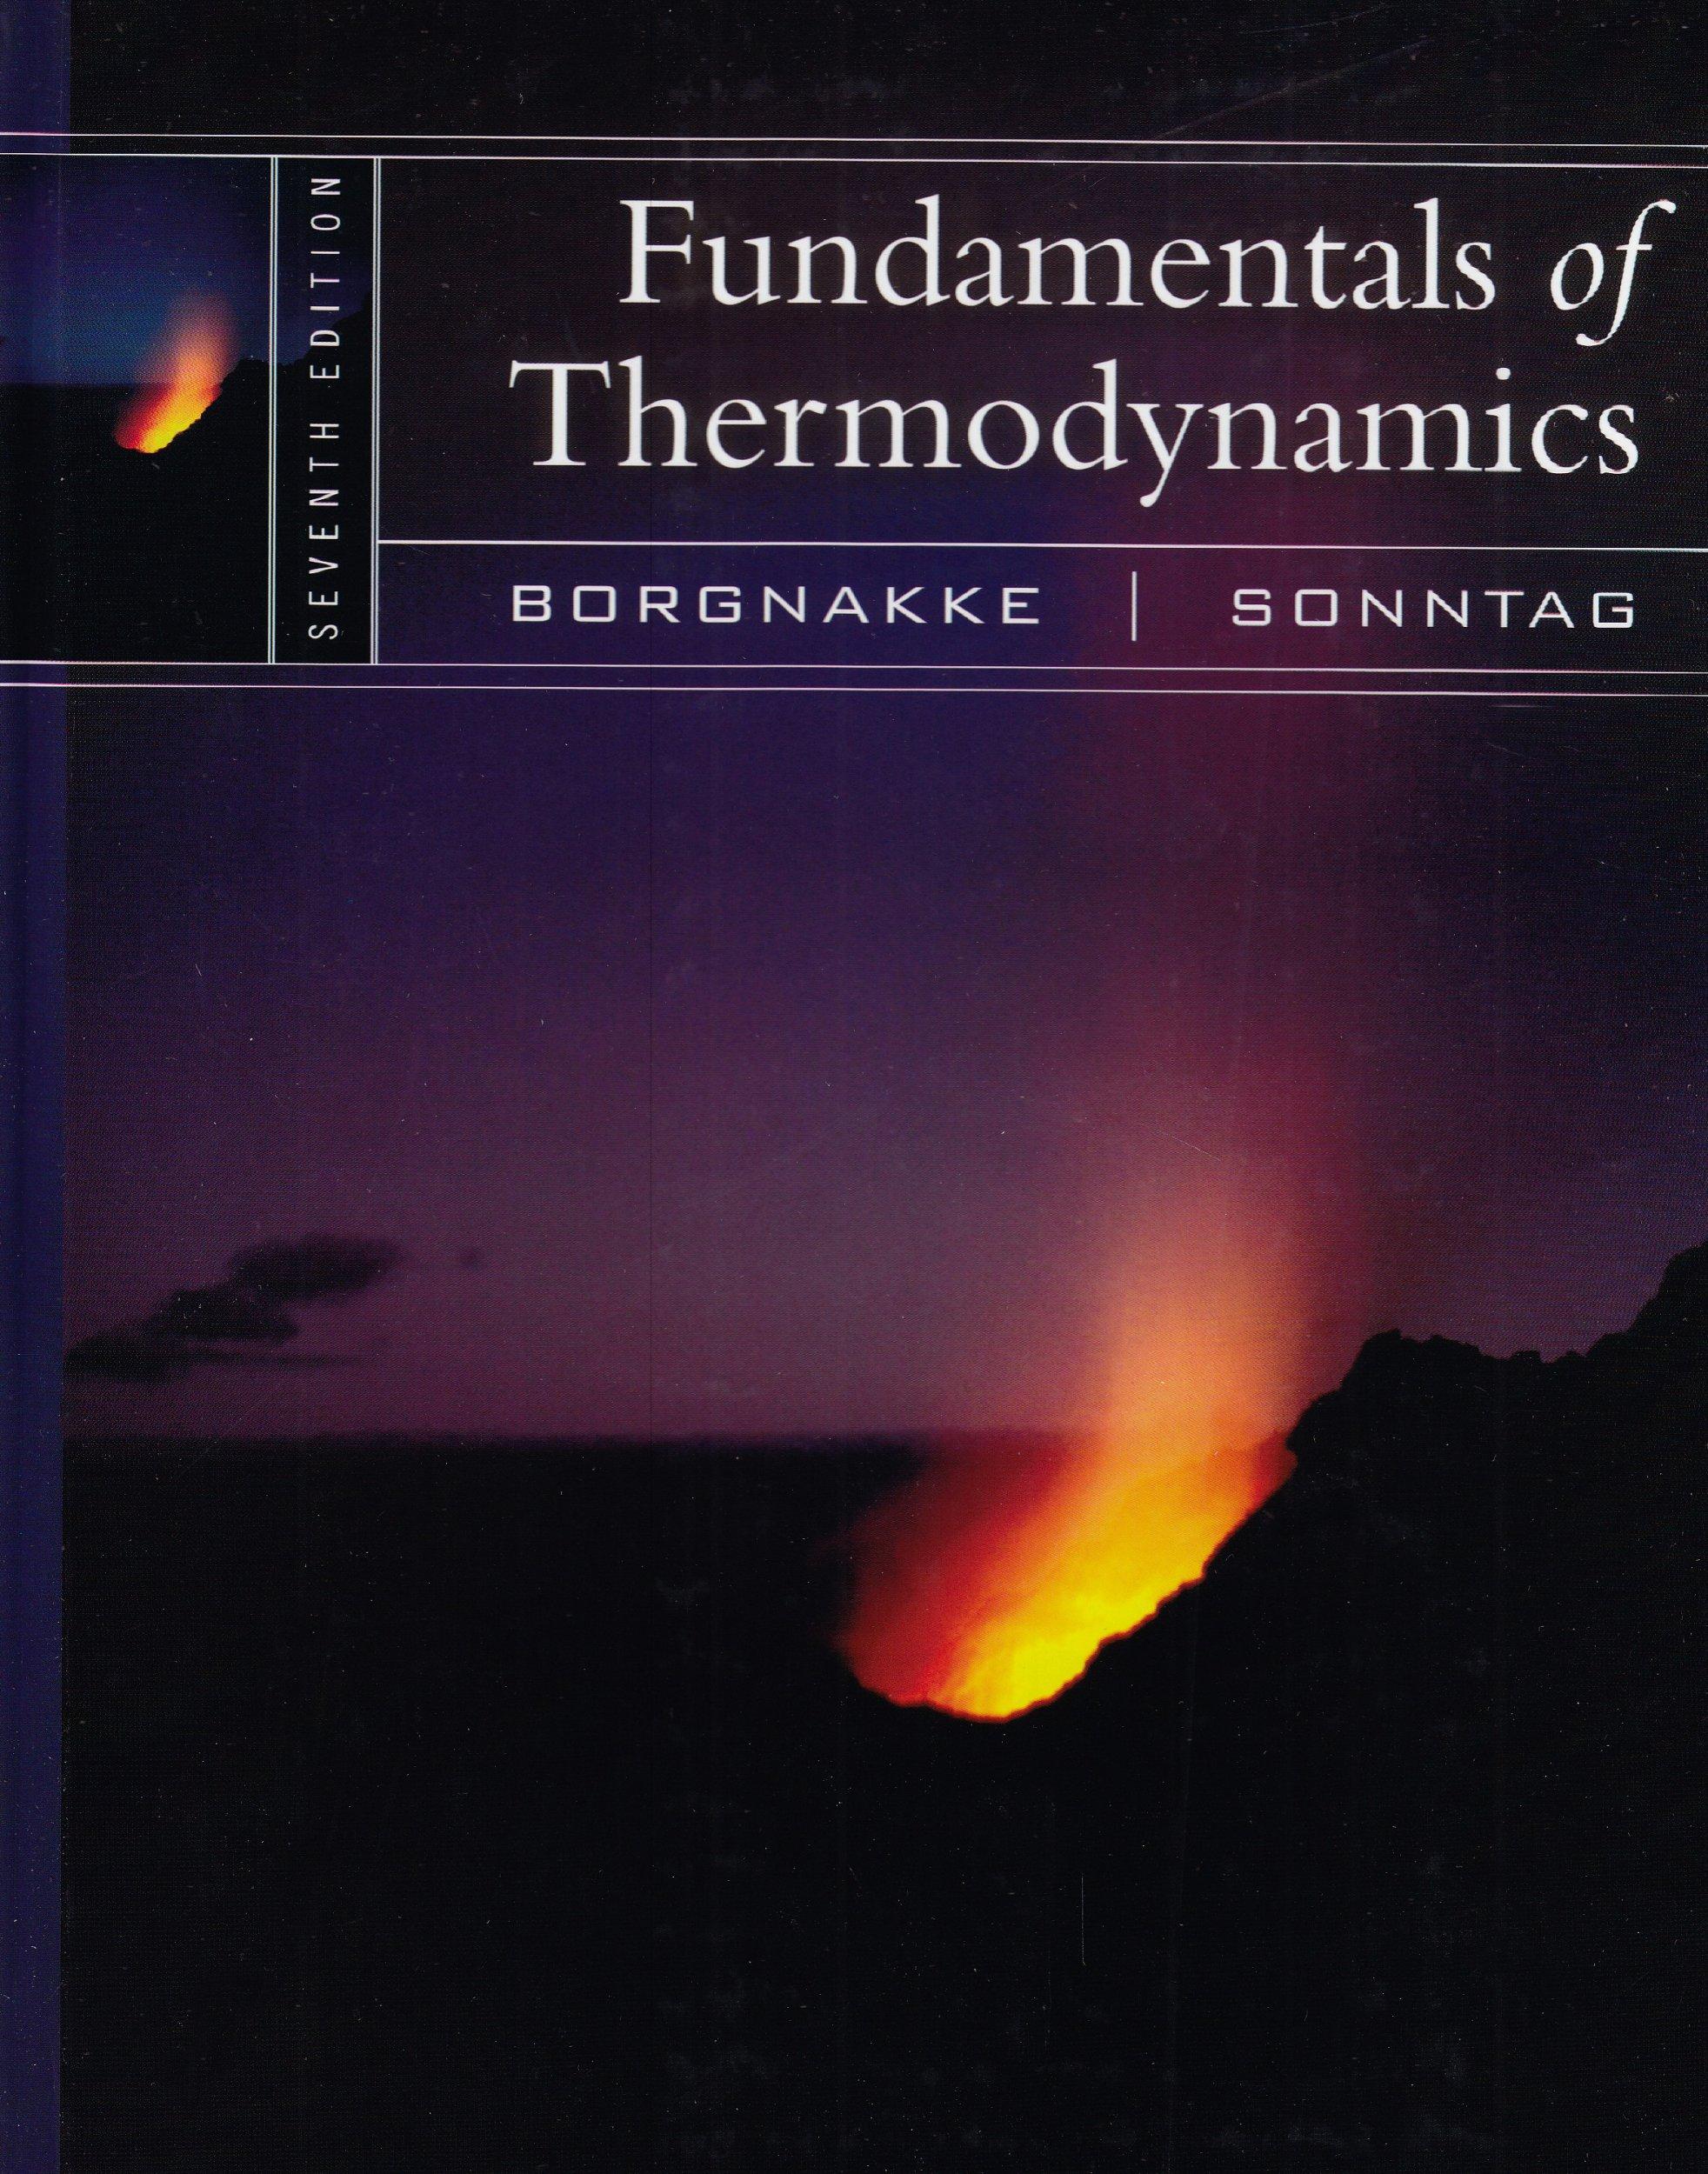 THERMODYNAMICS SONNTAG EPUB